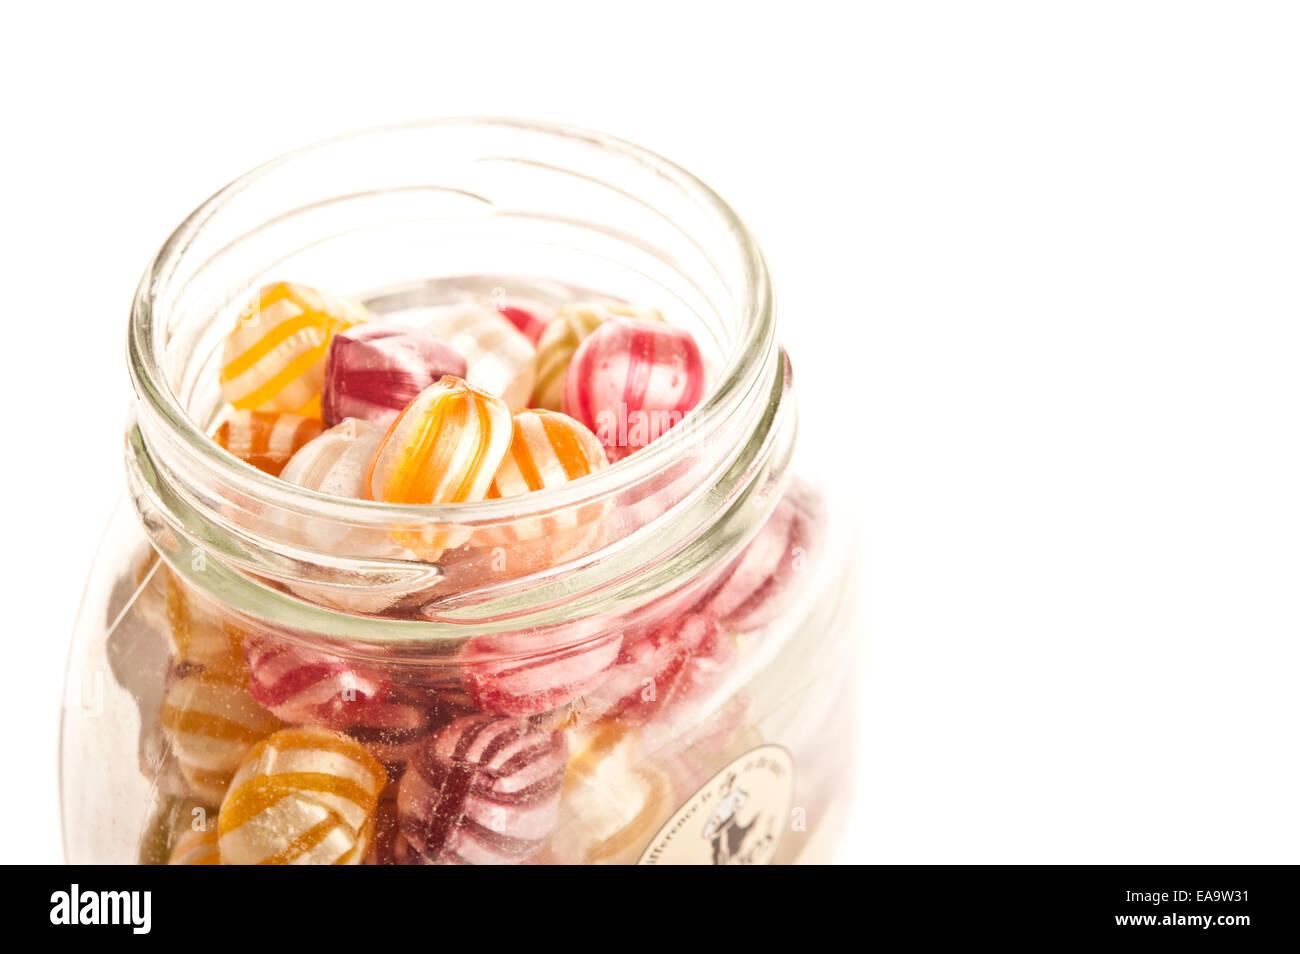 Glas mit Frucht Bonbons Mrs Bridges Stockbild